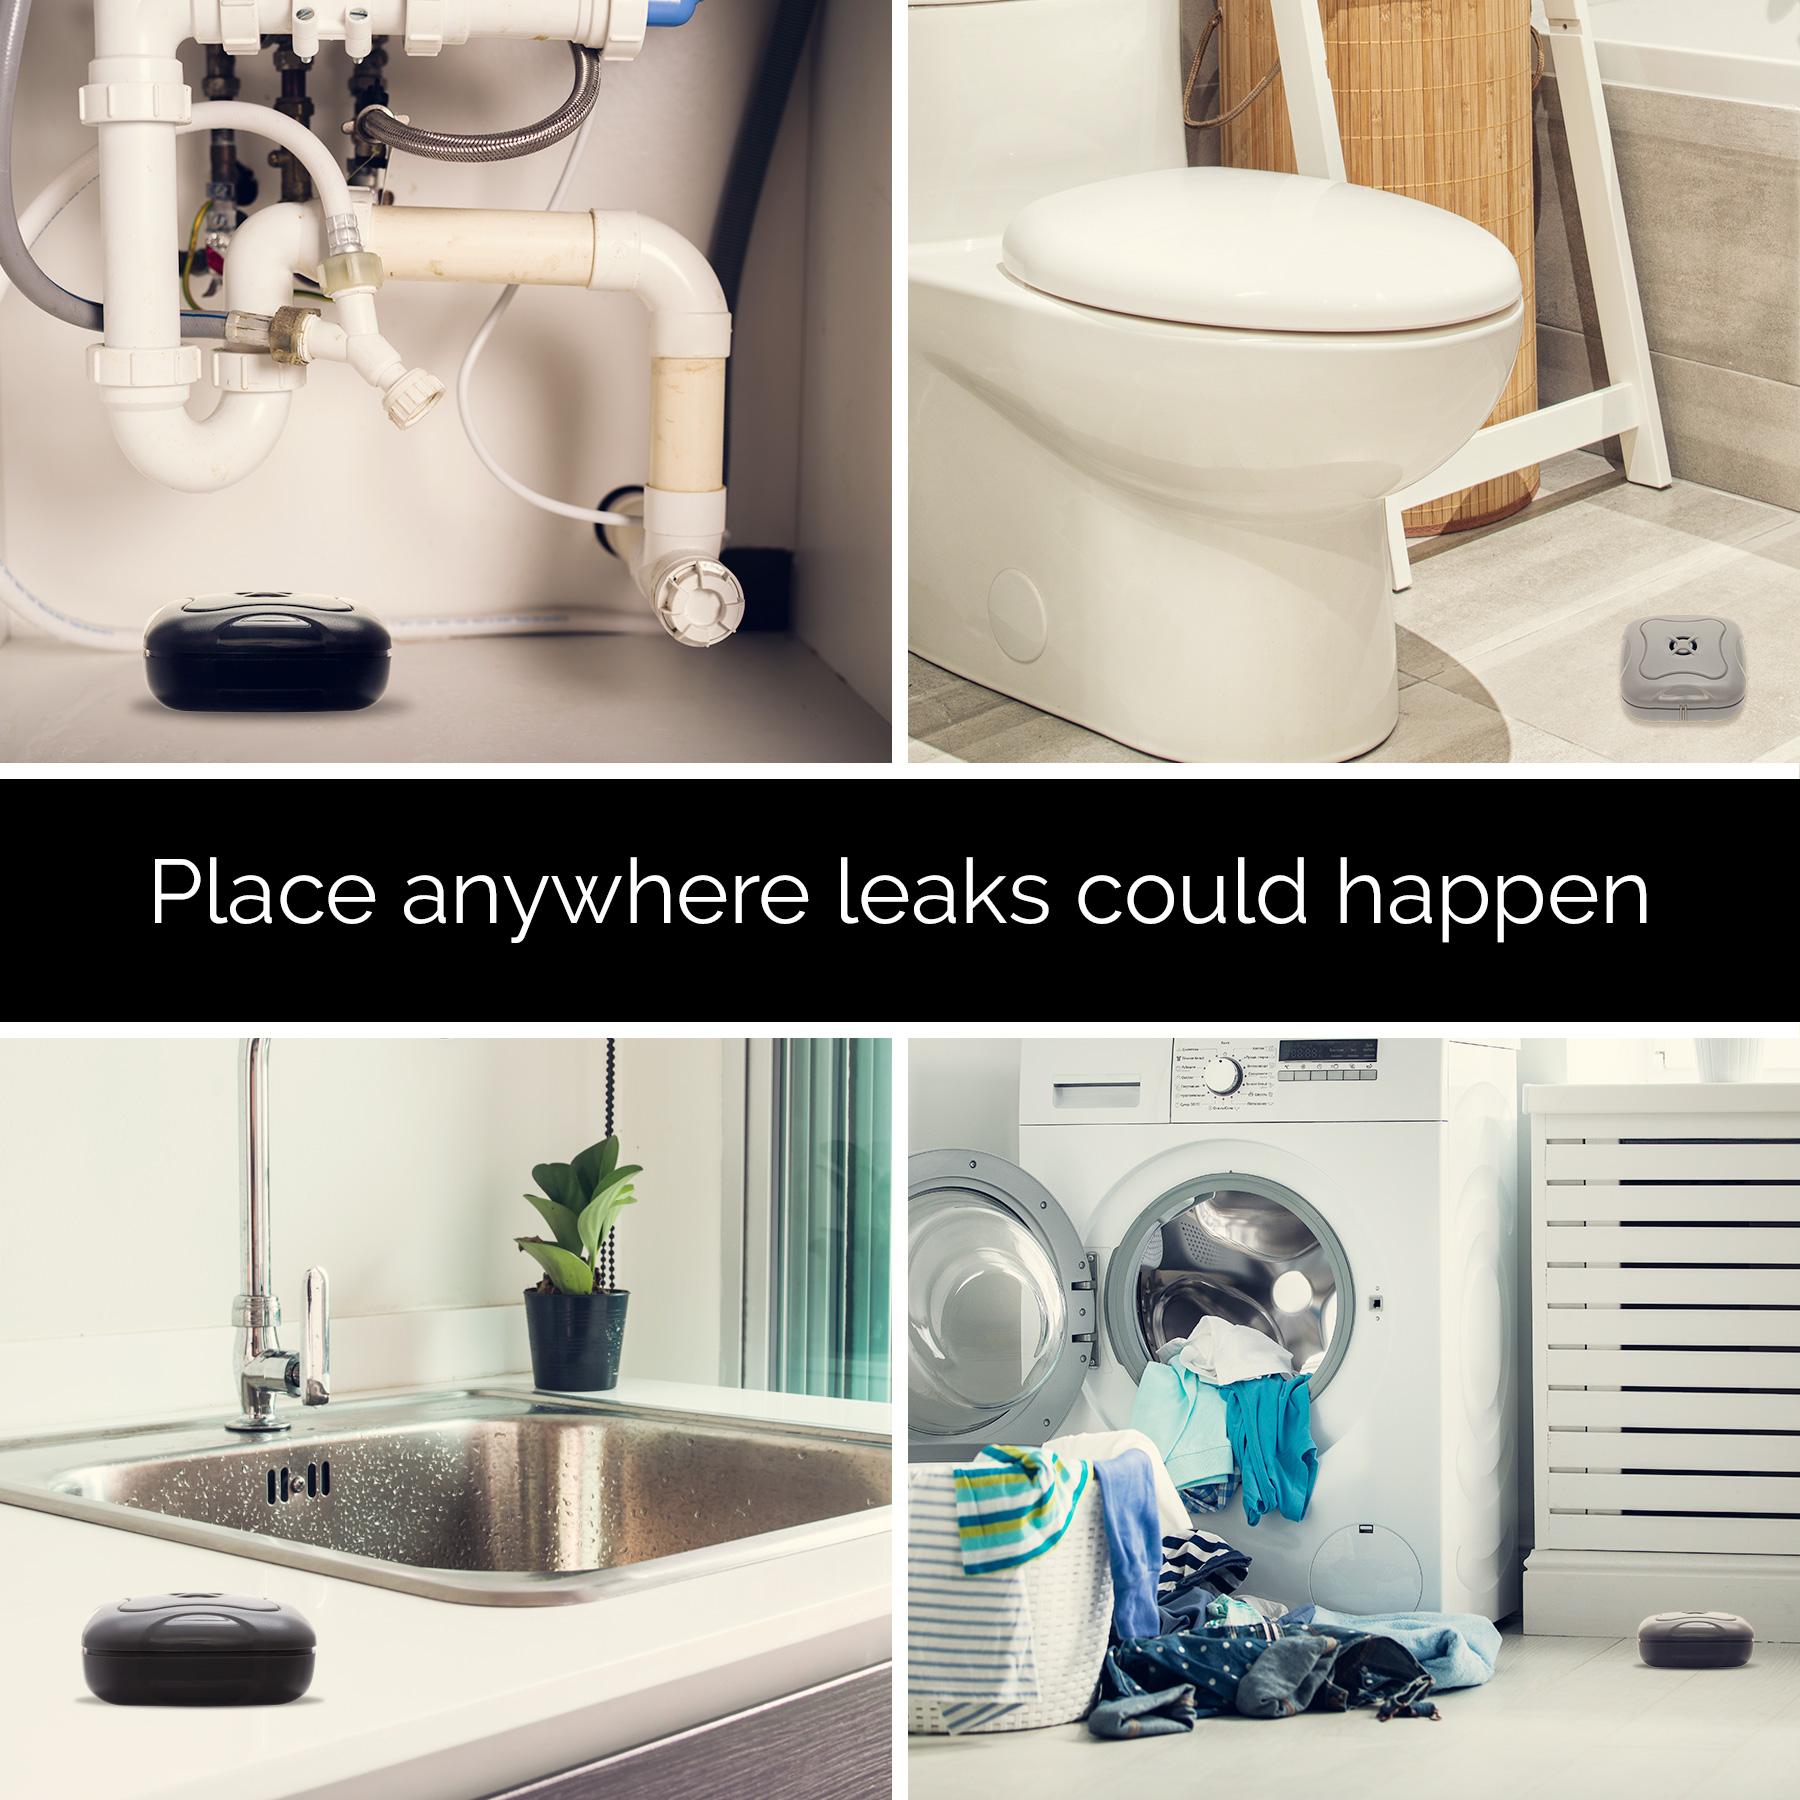 Mindful Design NEW Home Water Leak Detection Flood Alarm Sensor EBay - Bathroom leak detection